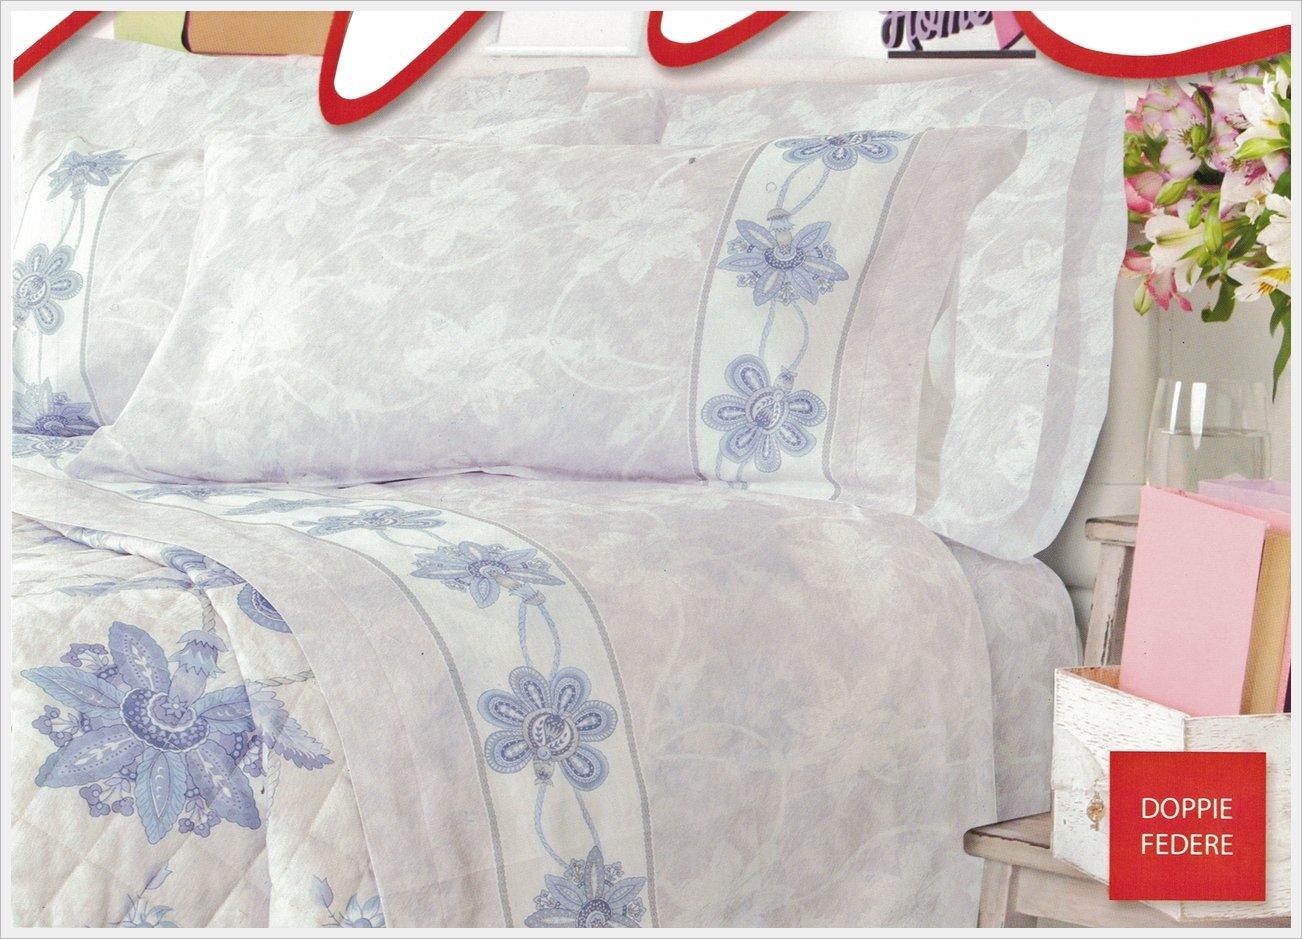 FRISE/' Matrimoniale 100/% Cotone Percalle 70 Fili Completo lenzuola MAE 4 Federe